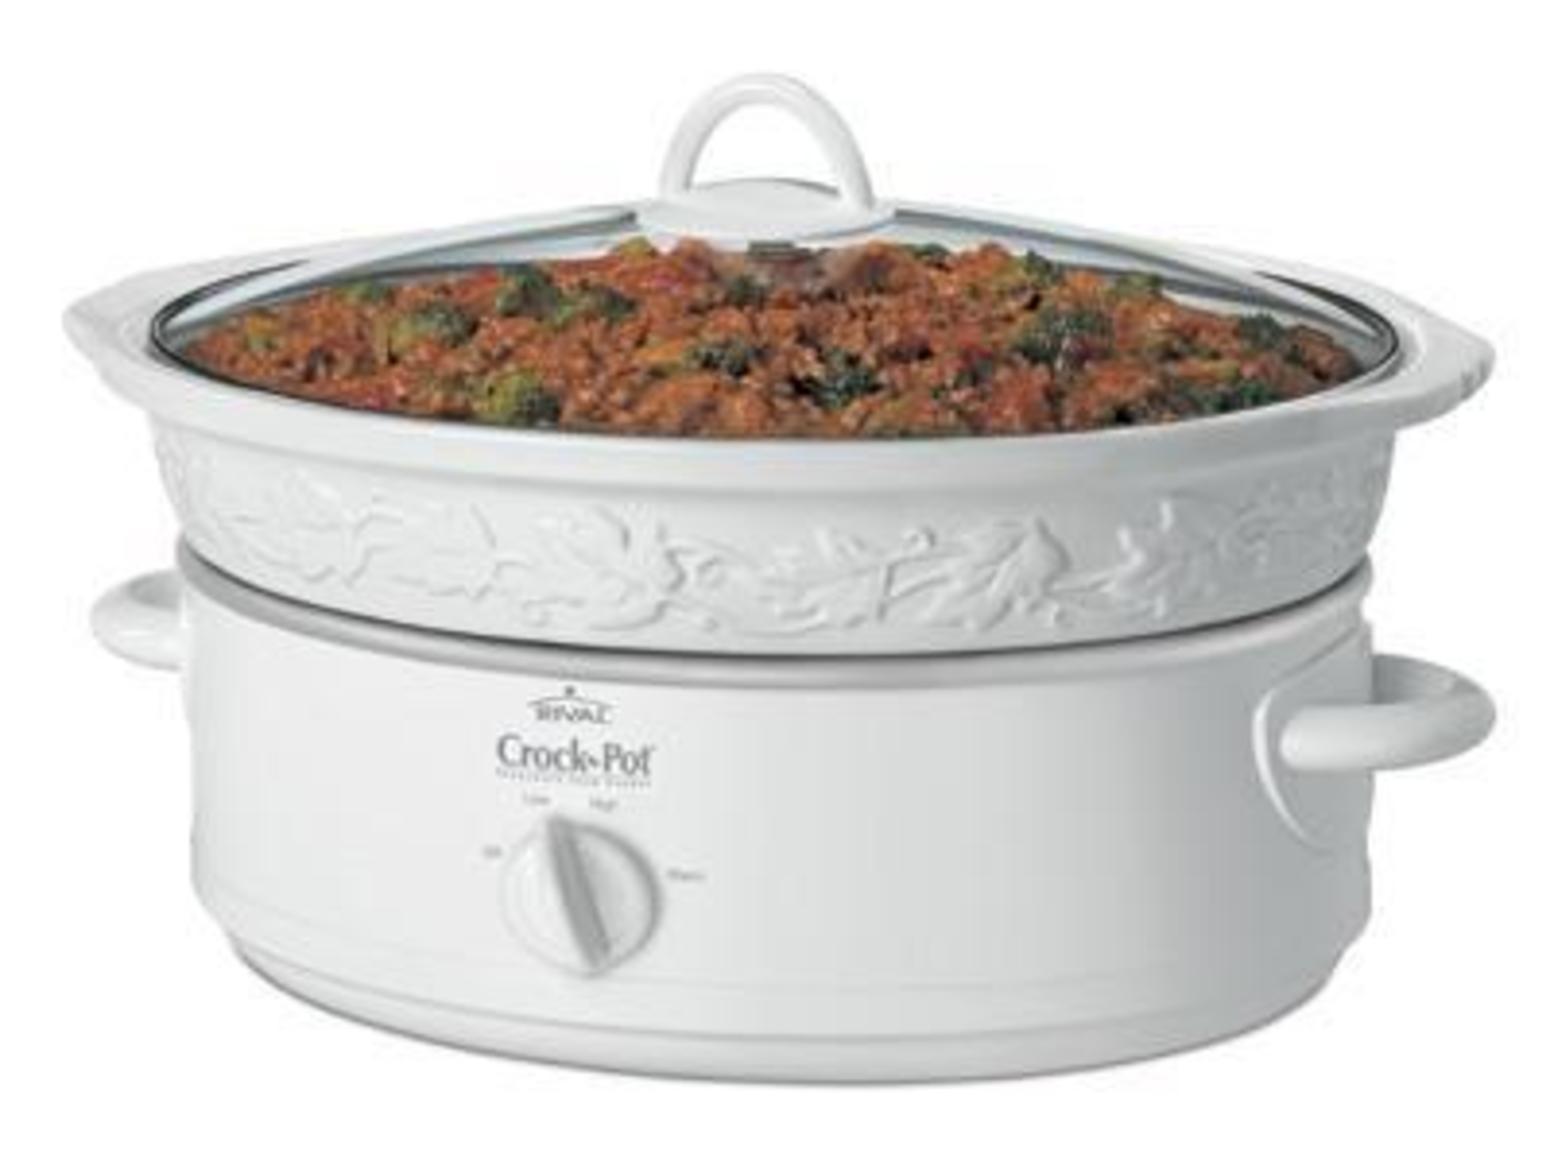 Crock Pot - Raspberry Balsamic Glazed Meatballs Recipe